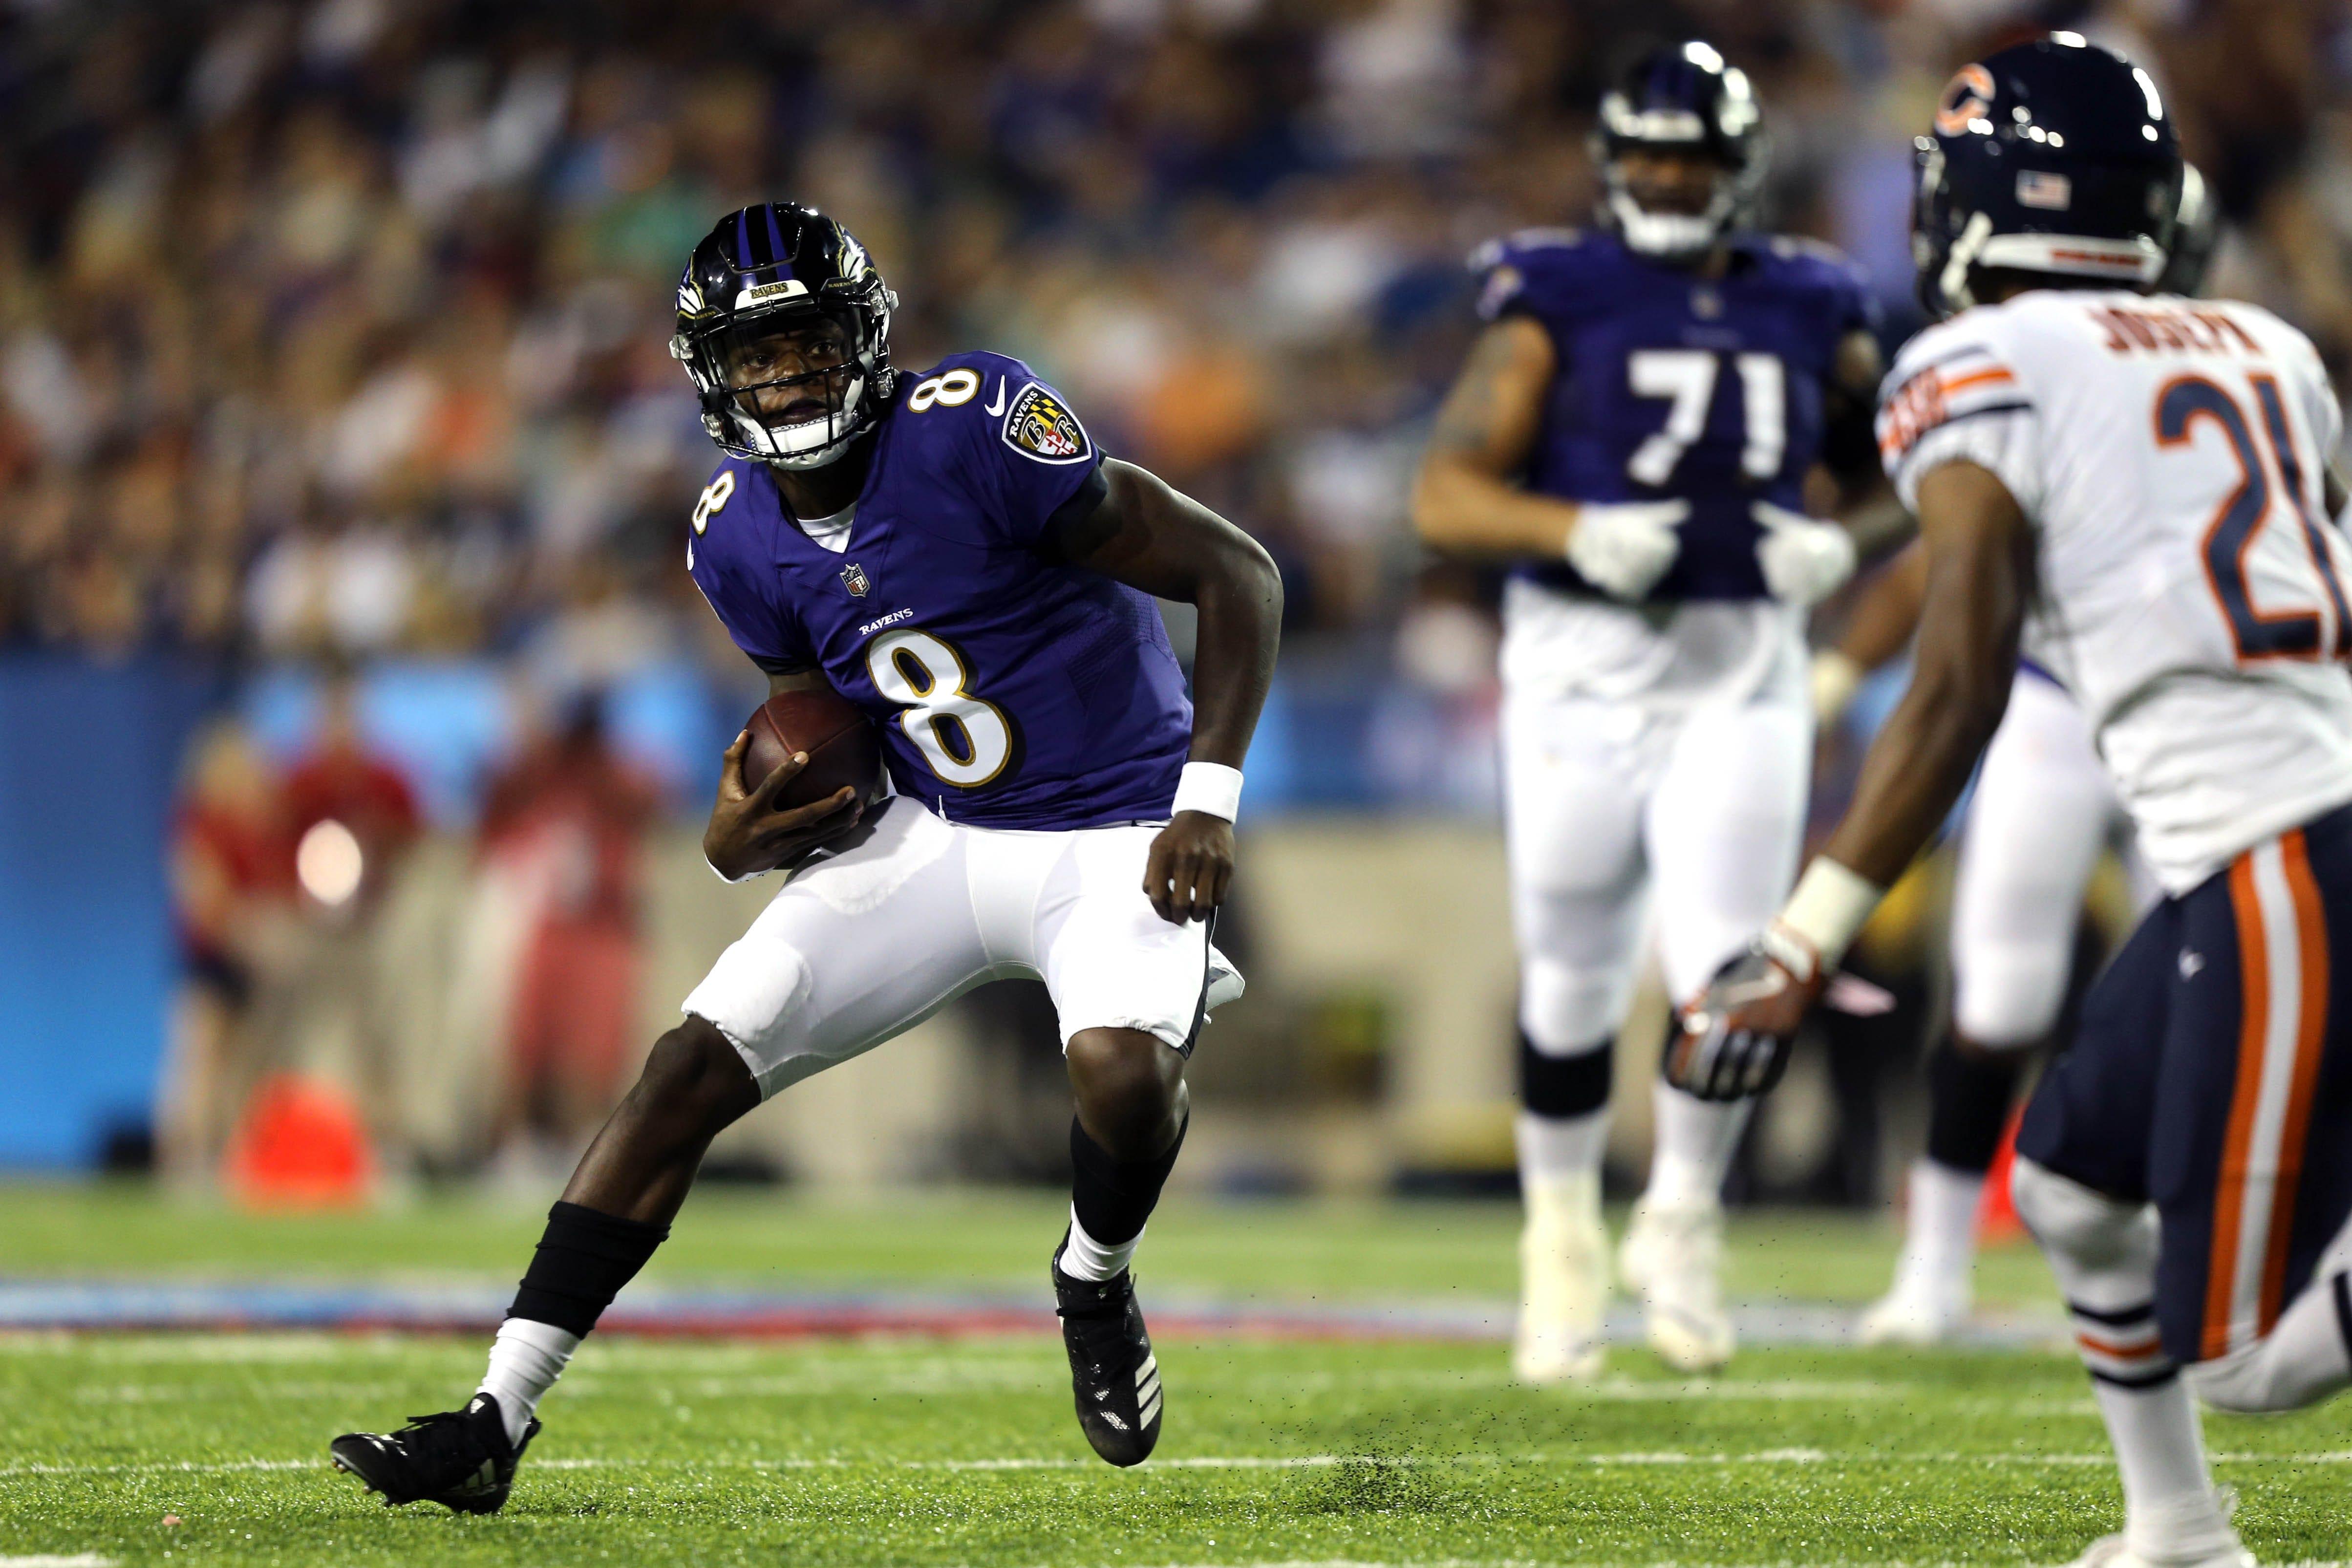 f833dc889 Ravens fans should temper their expectations for Lamar Jackson